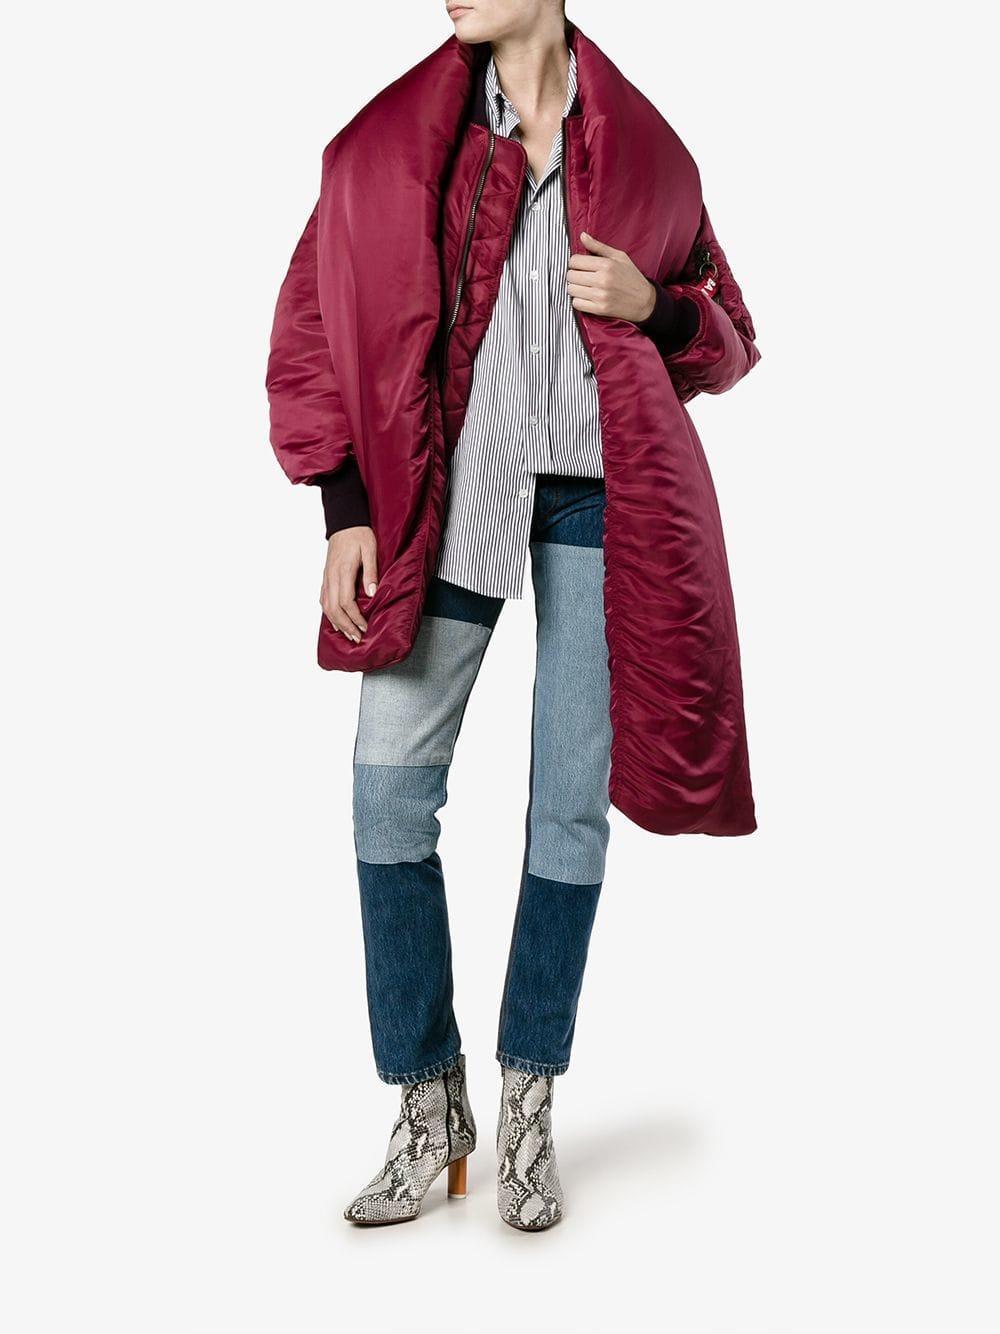 Balenciaga Detachable Collar Puffer Jacket Lyst